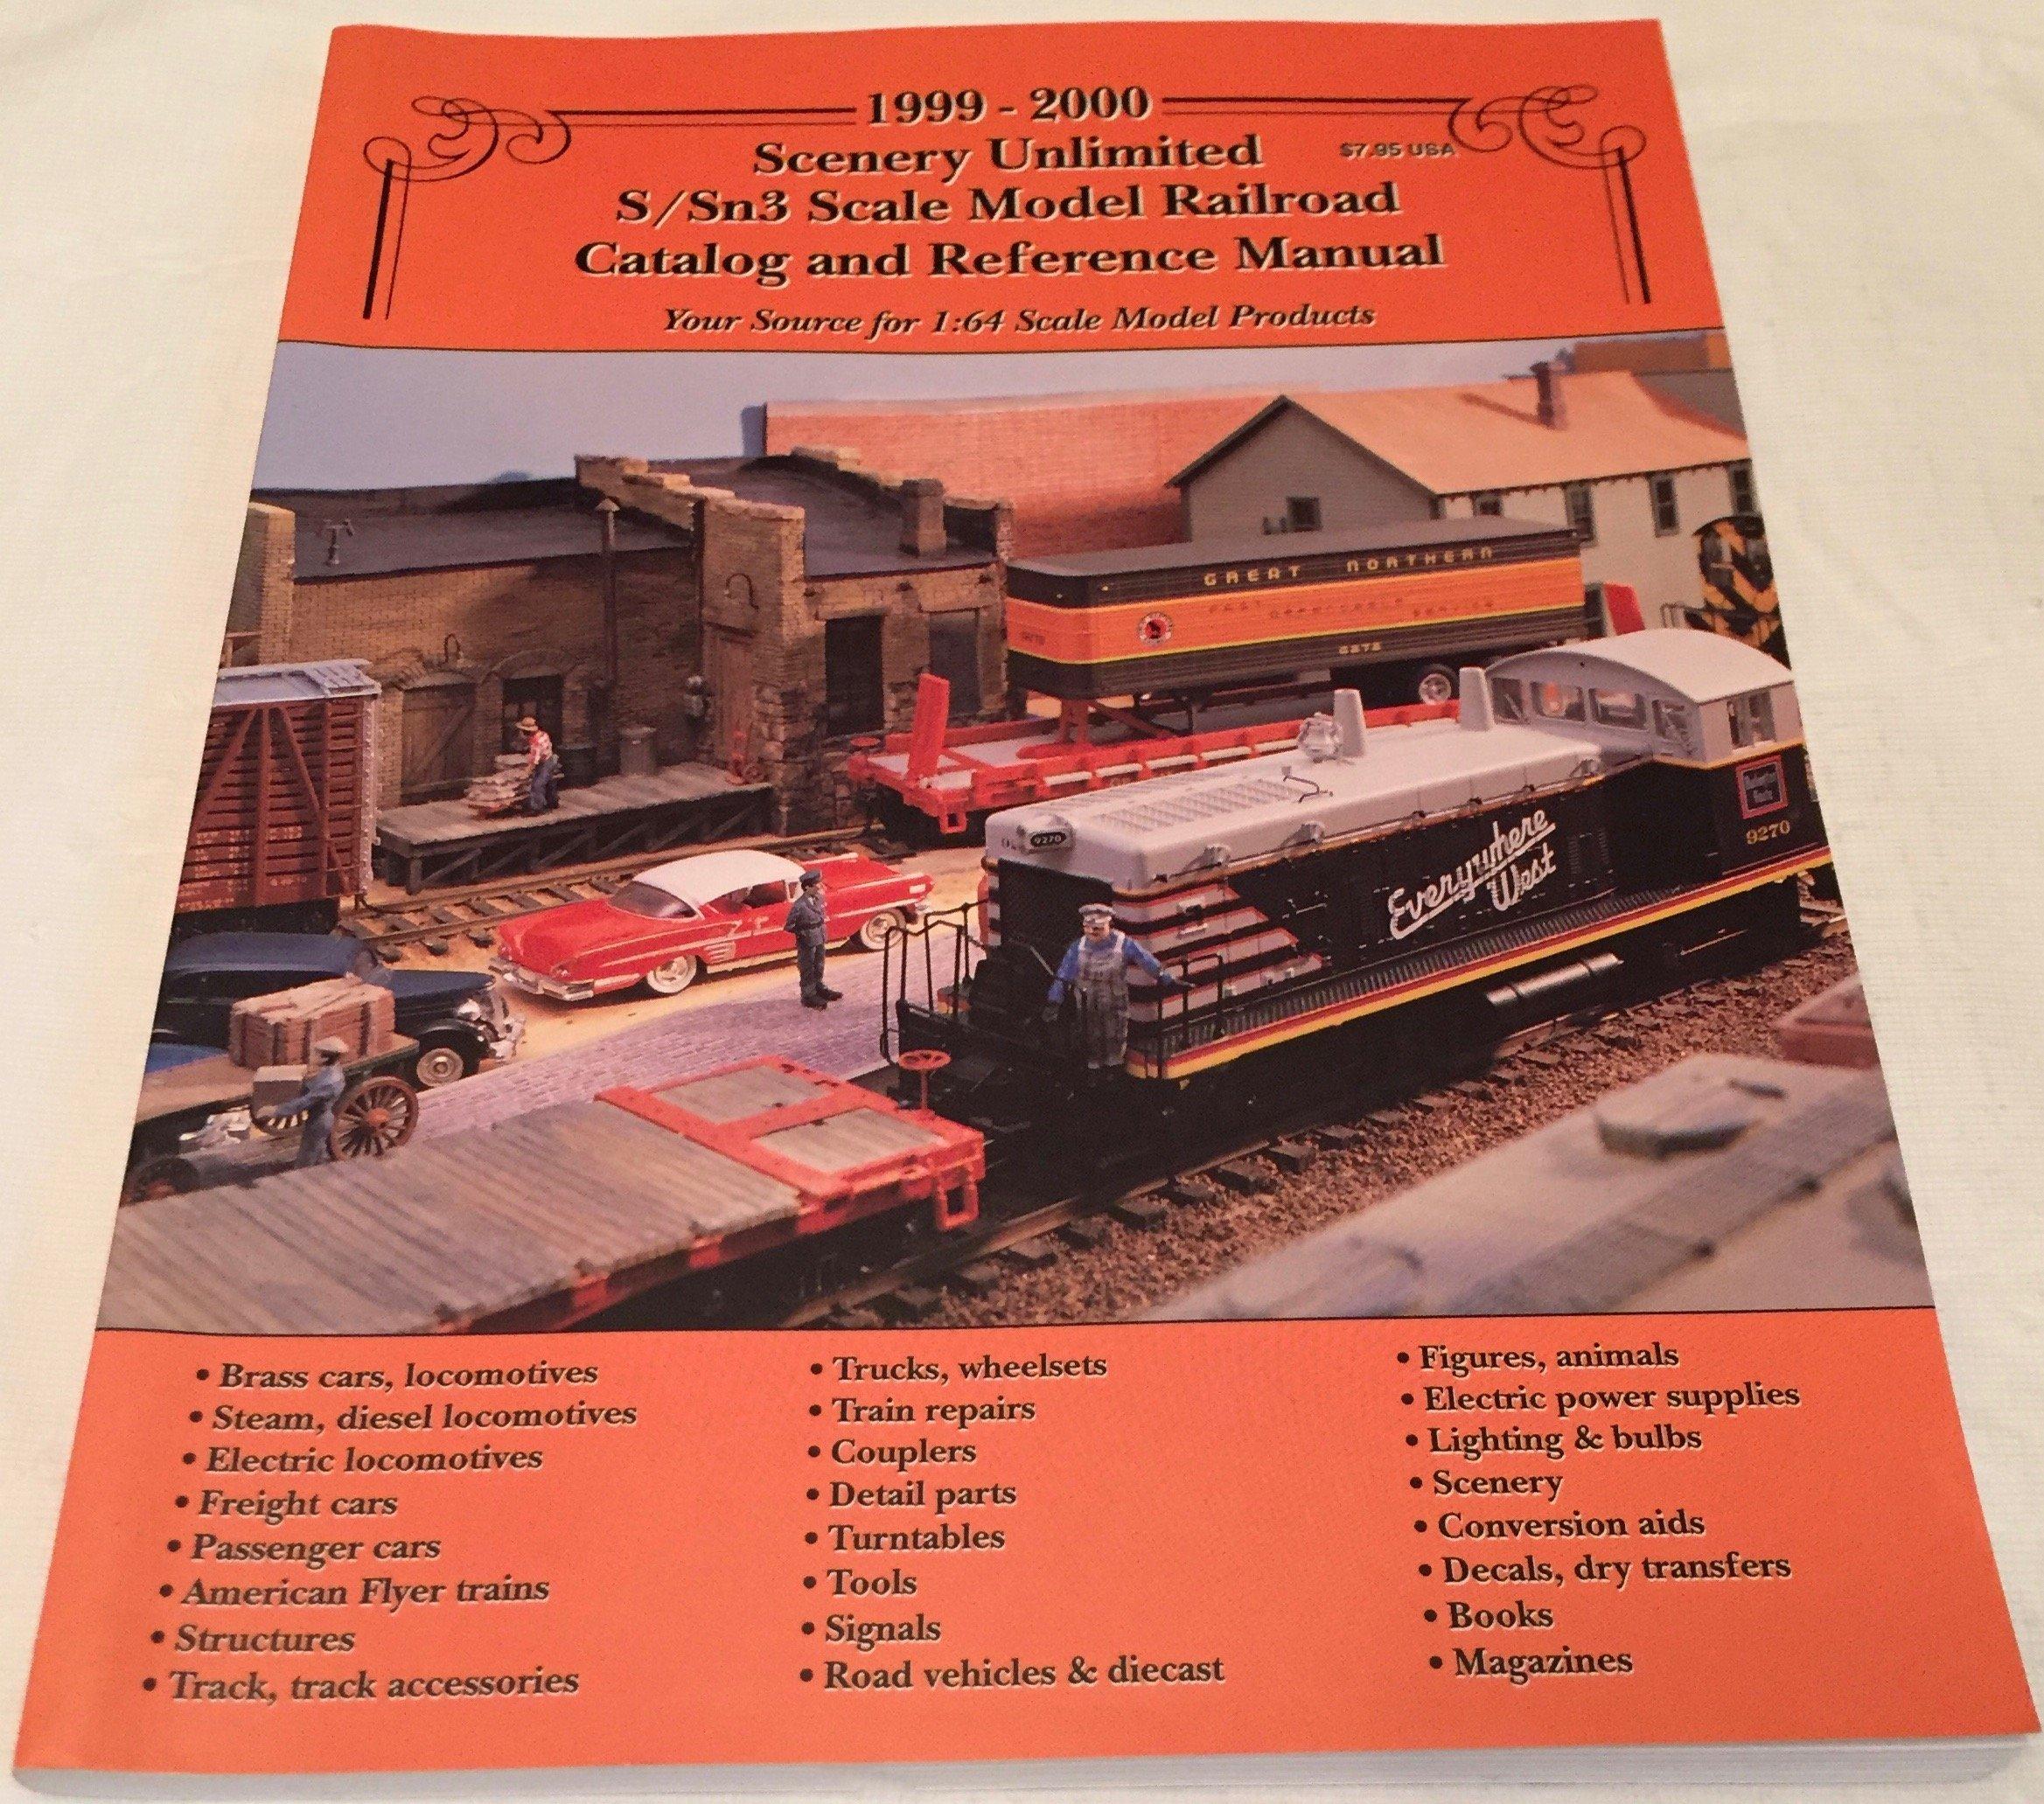 1999-2000 Scenery Unlimited S/Sn3 Scale Model Railroad